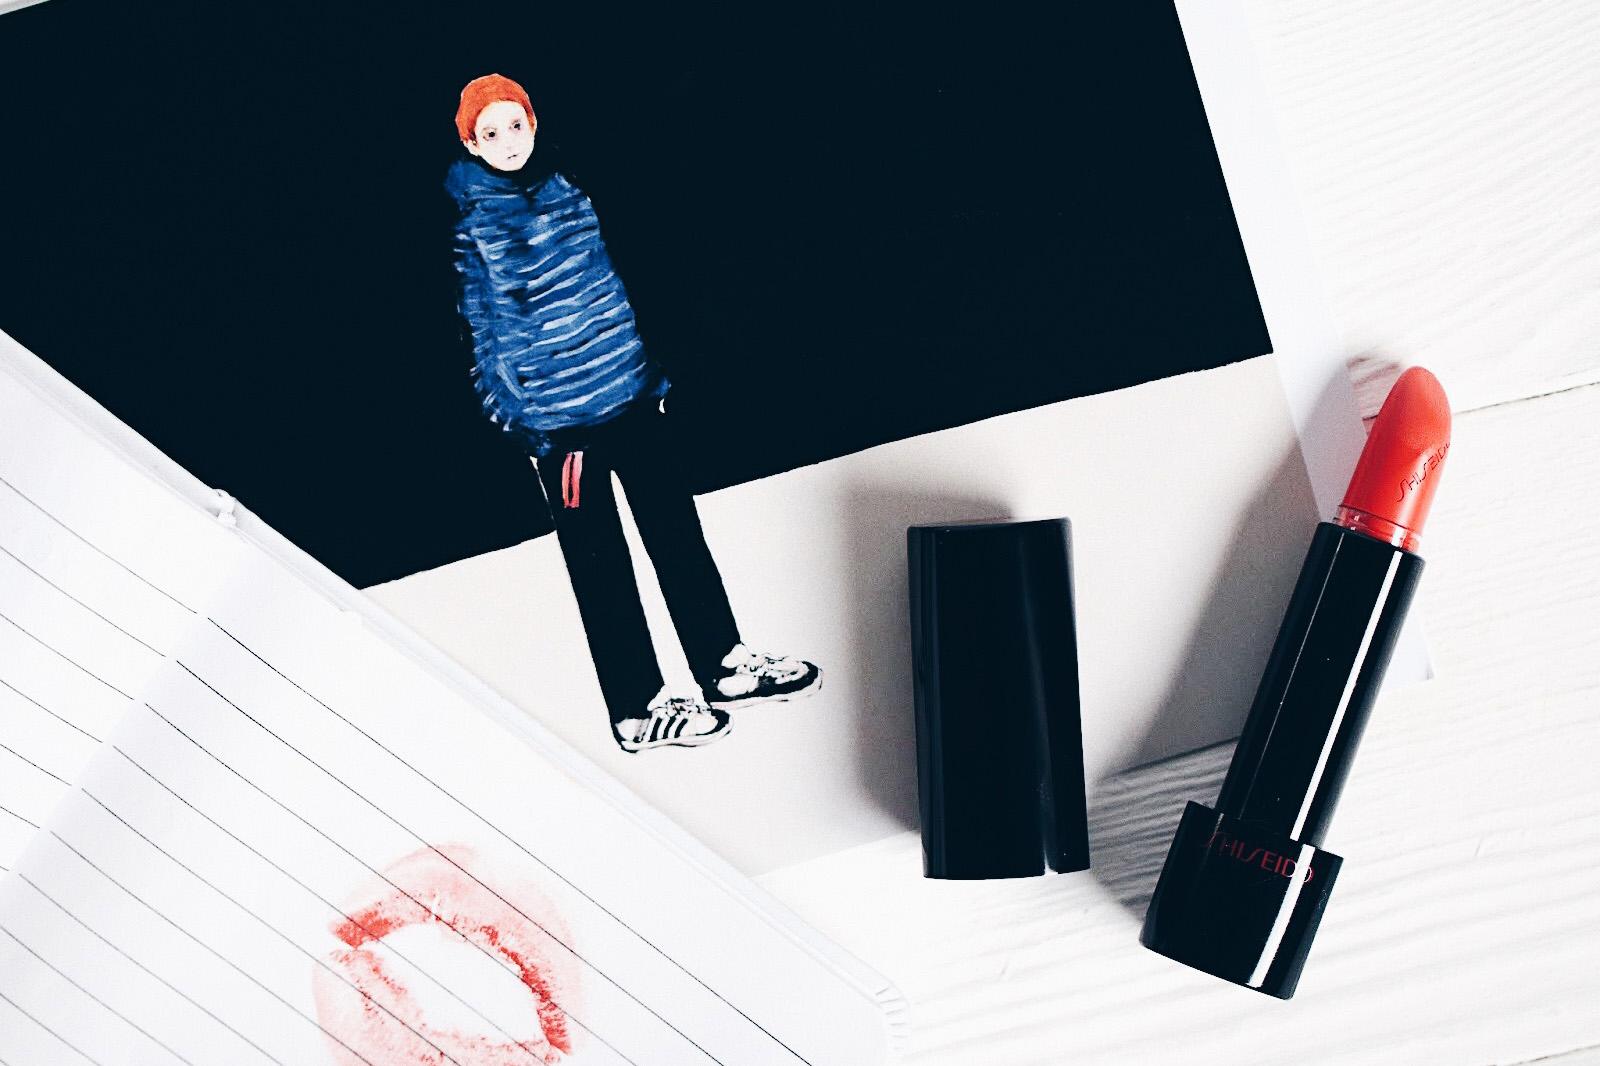 shiseido rouge rouge fini mat avis test swatches teintes